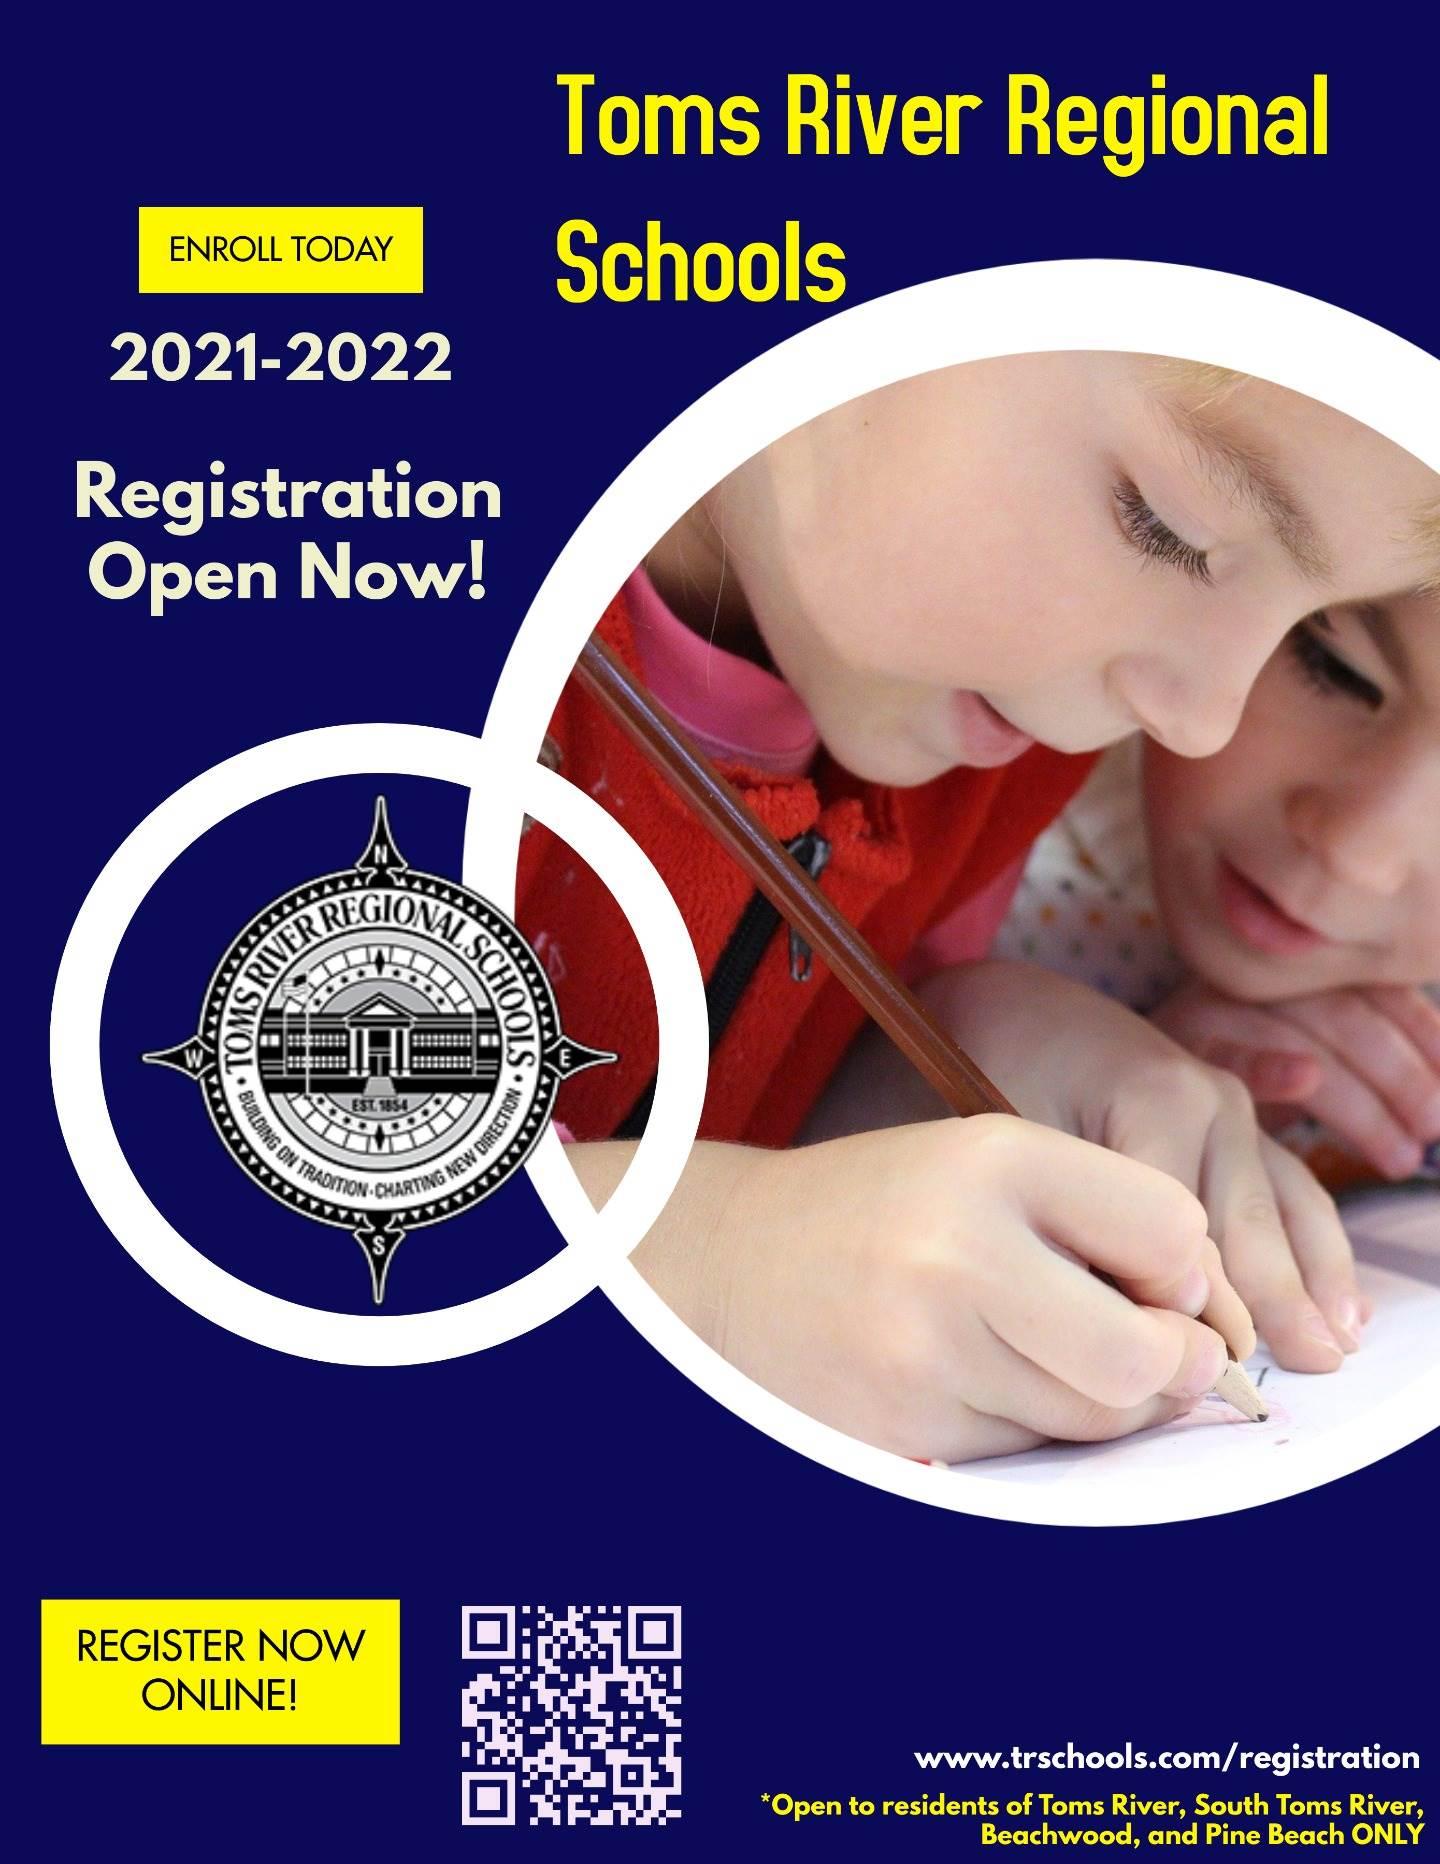 toms river regional schools enroll today 2021 2022 registration open now